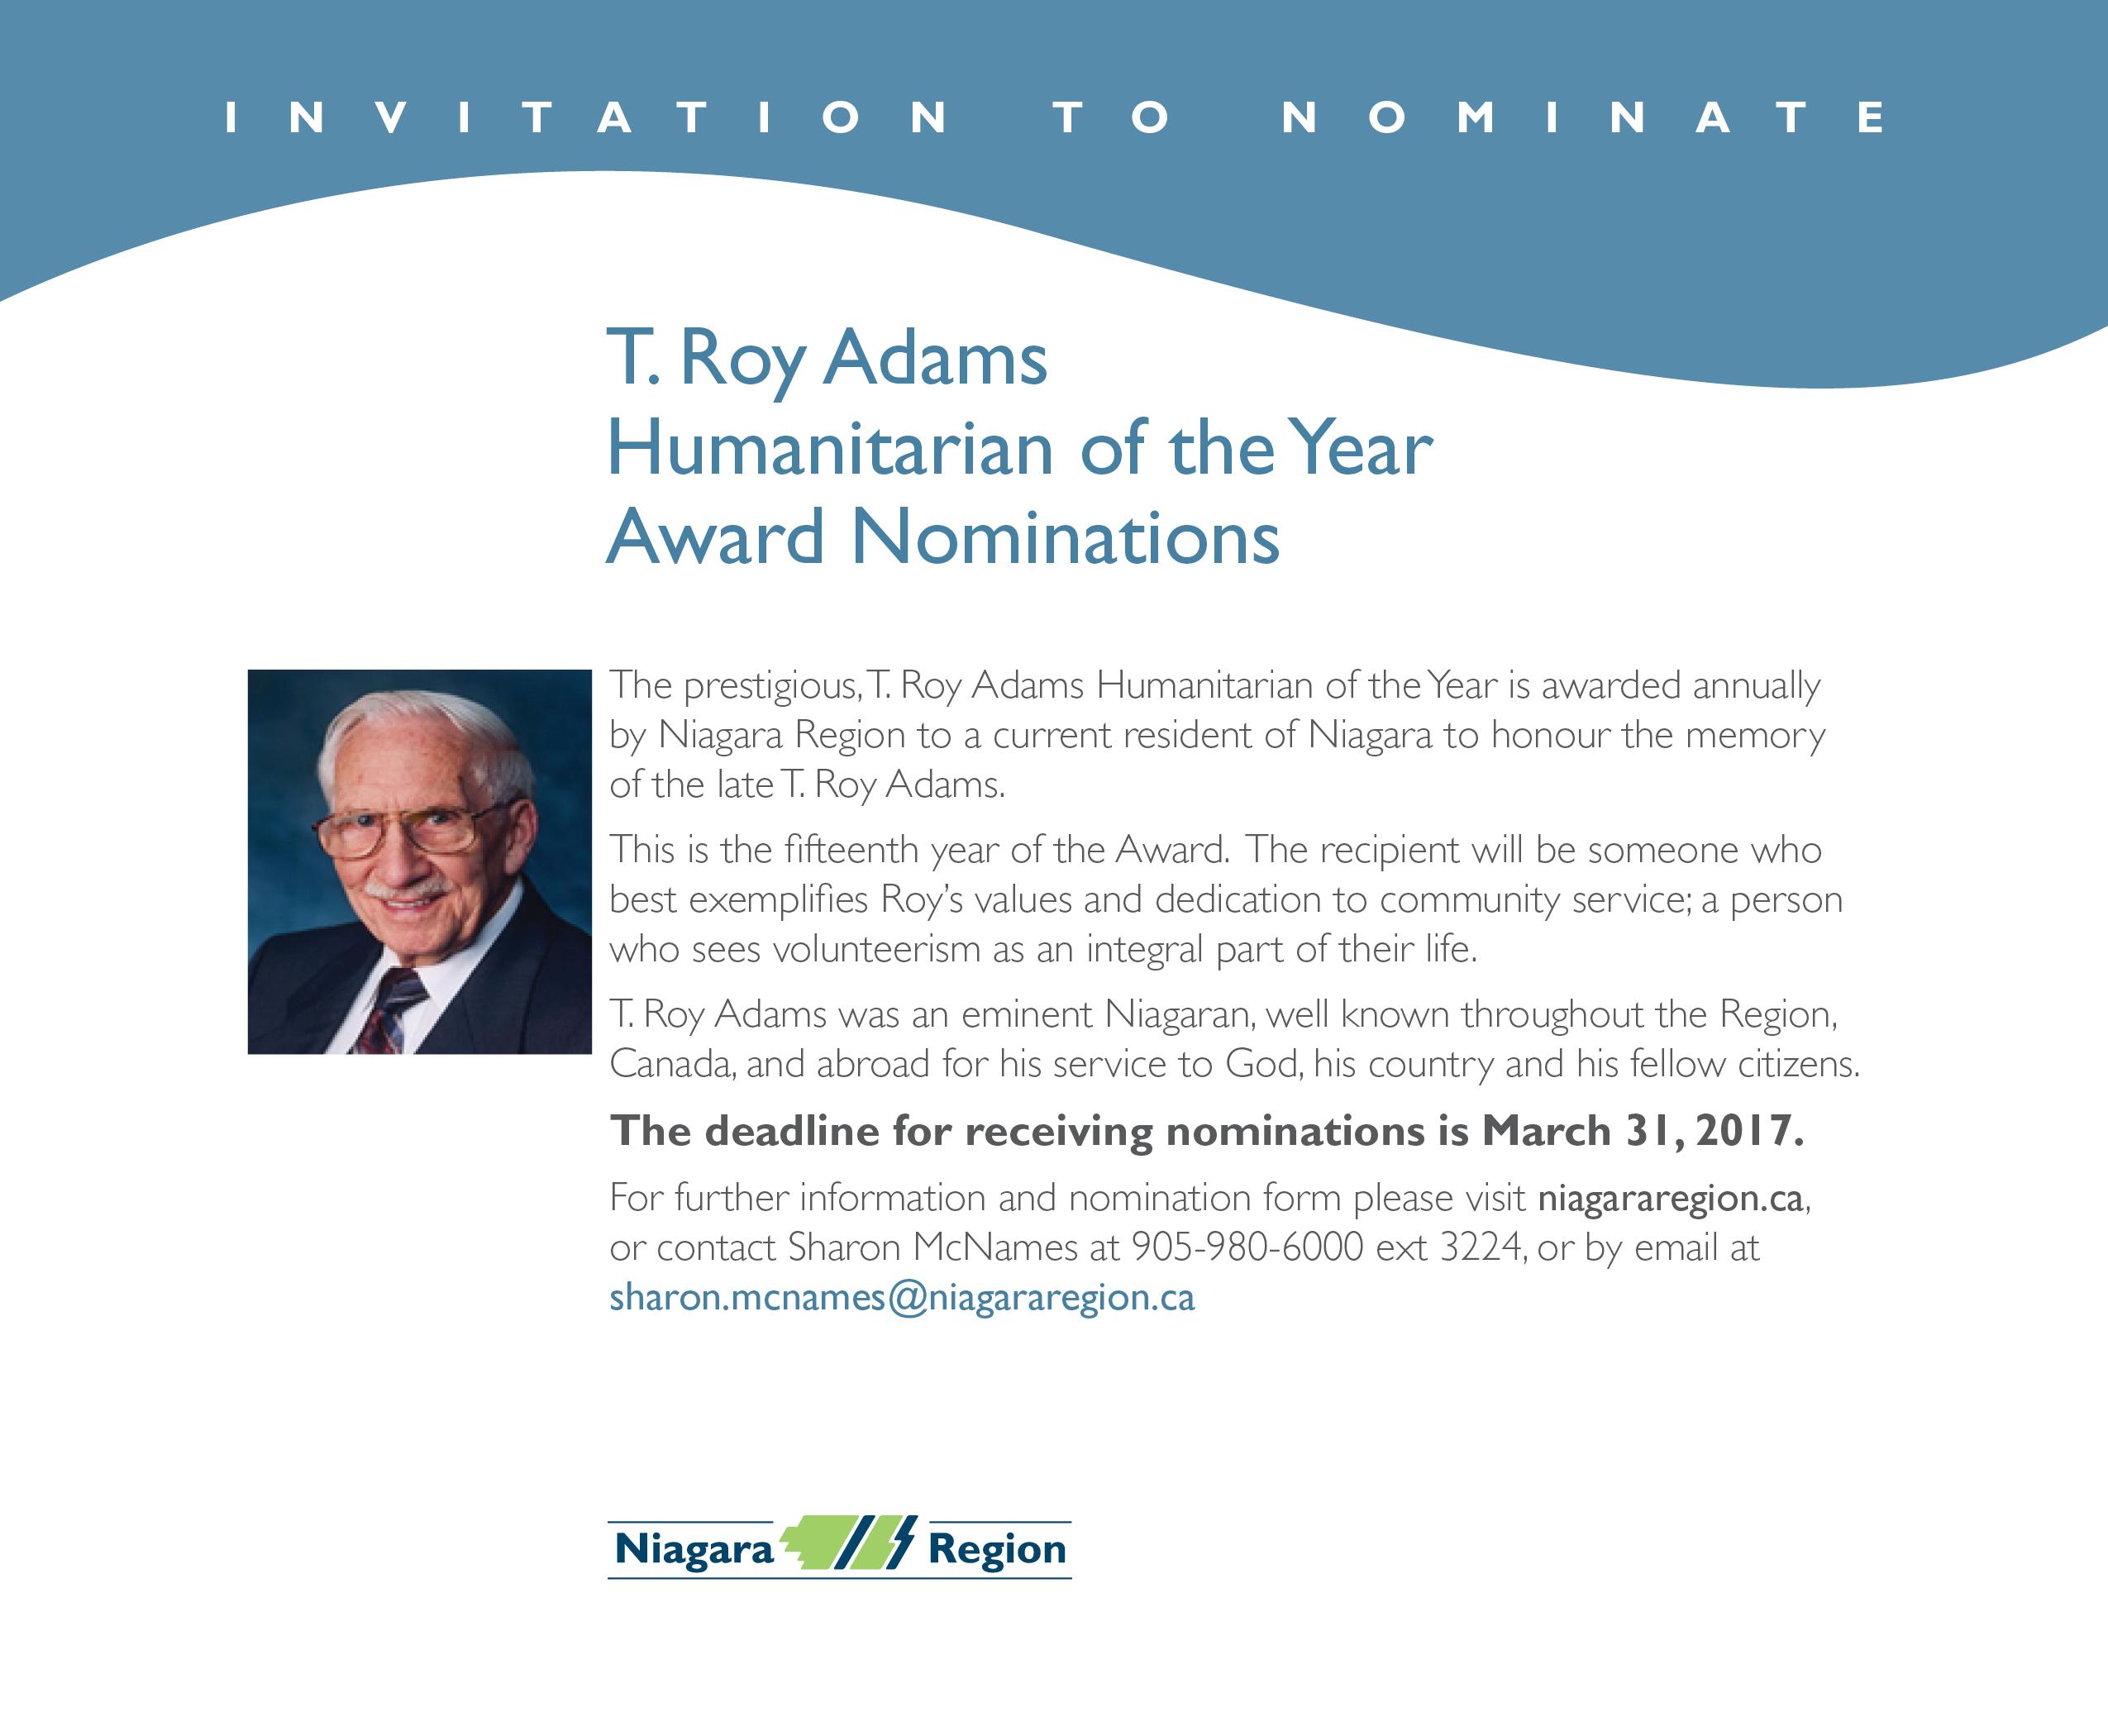 T. Roy Adams Humanitarian Award 2017